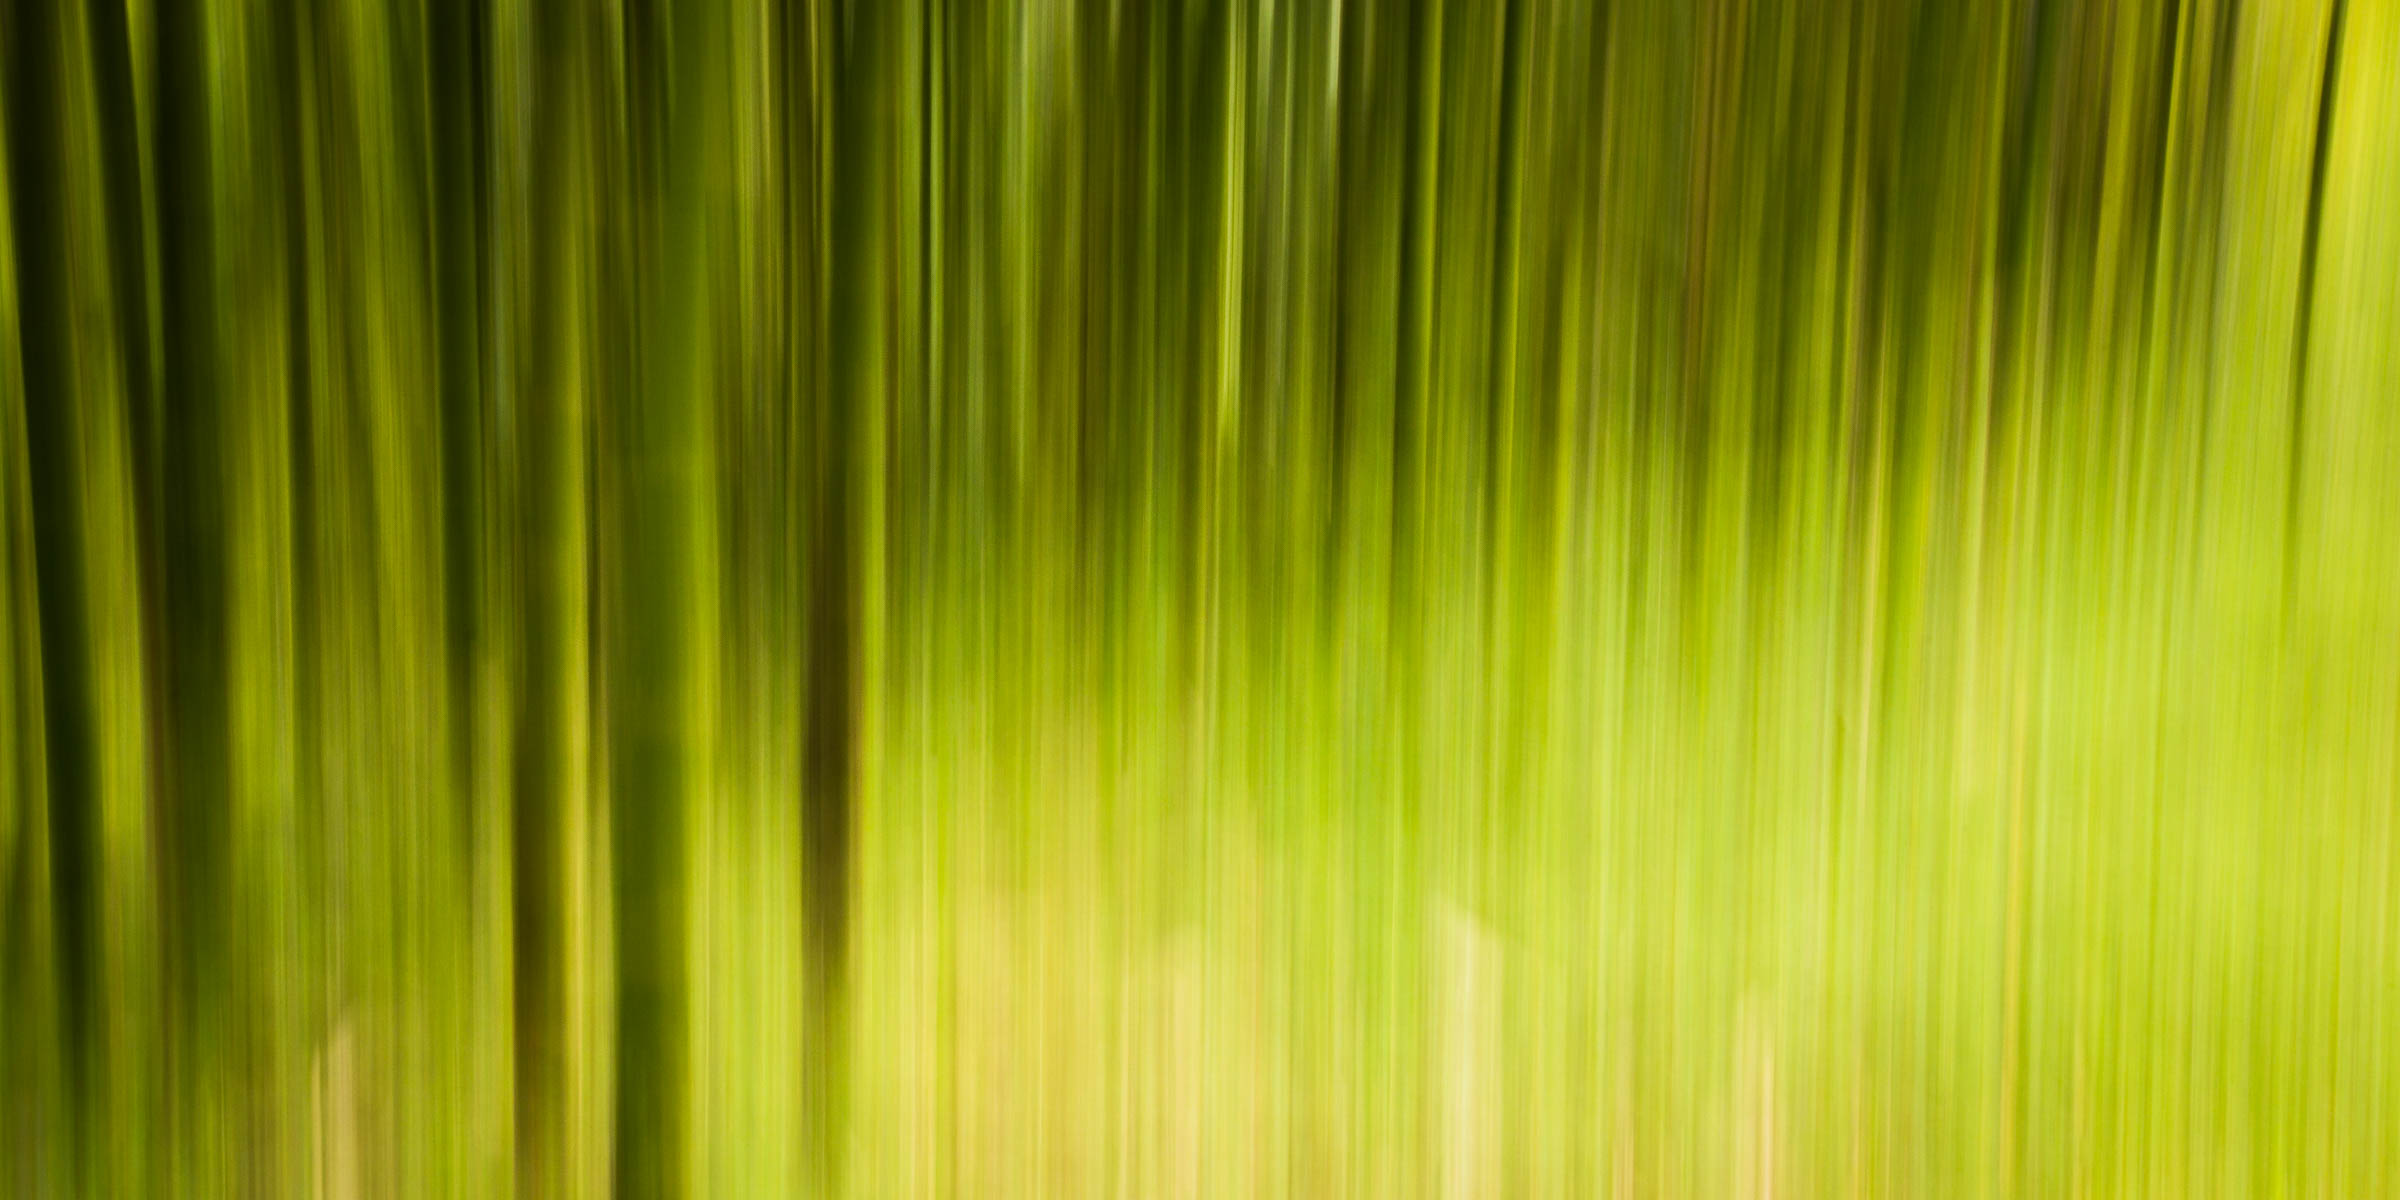 _MGL8950_Bamboo in the Mist.jpg